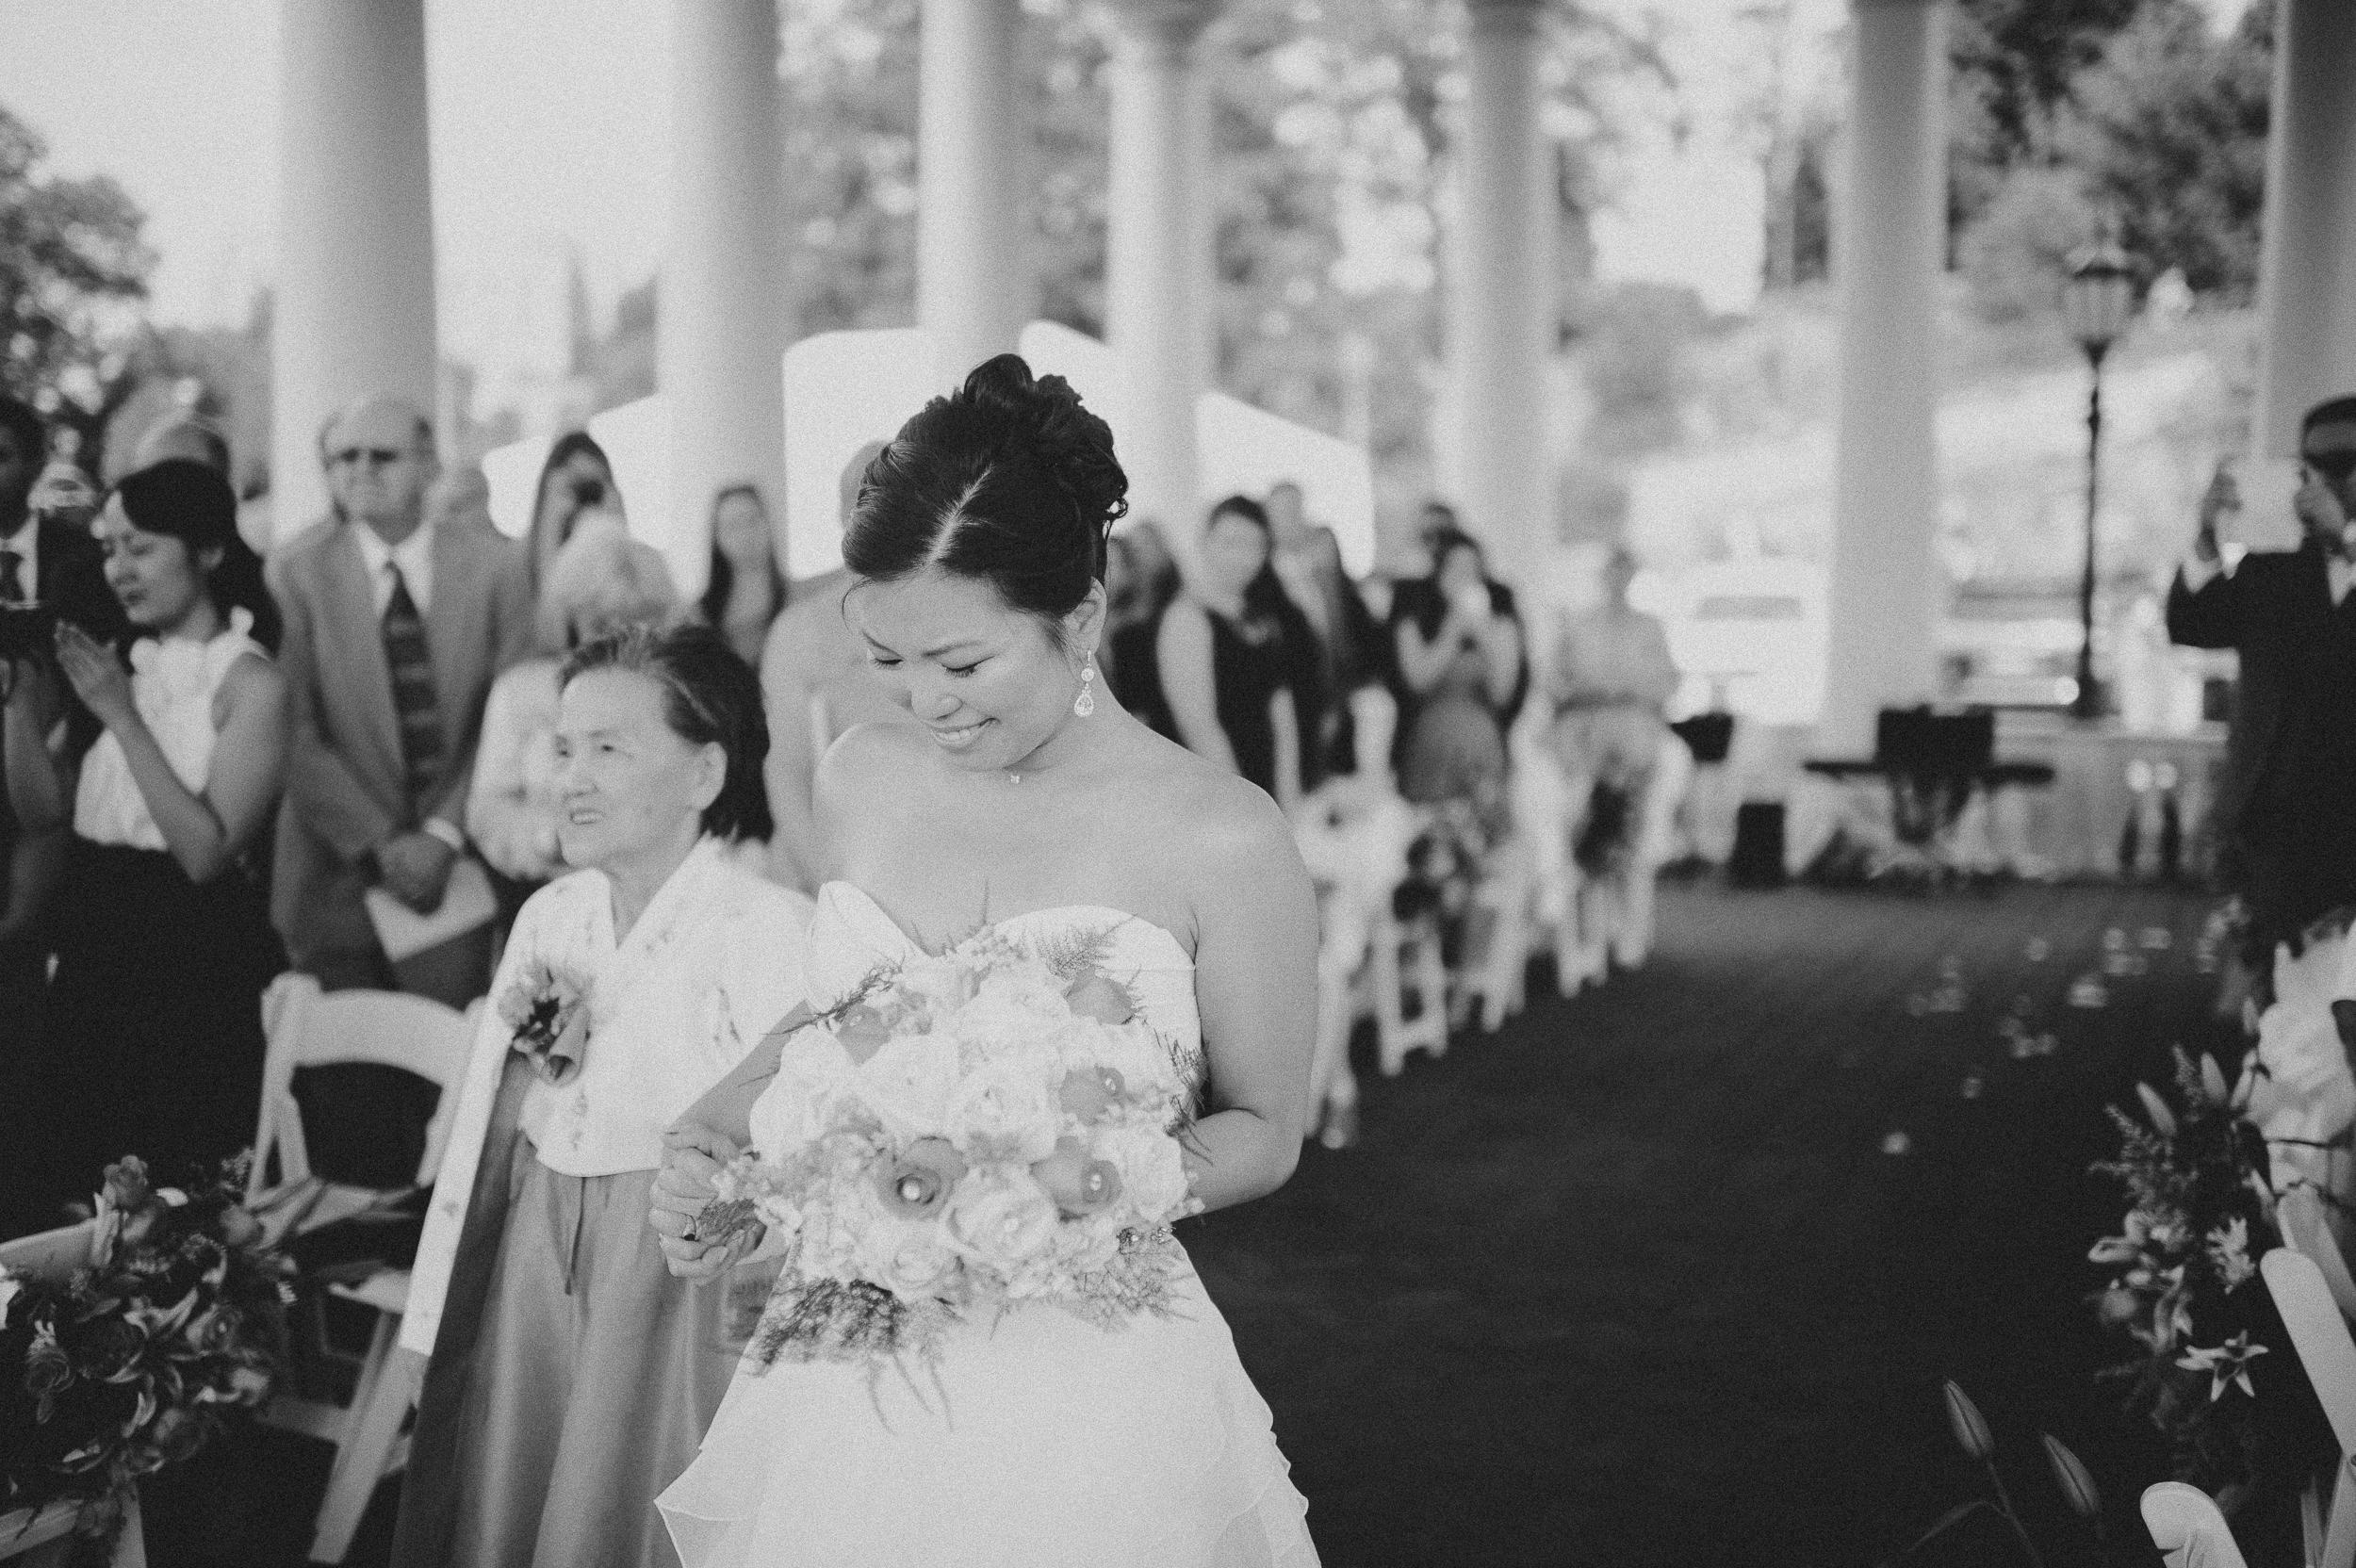 union-trust-philadelphia-wedding-photographer-39.jpg